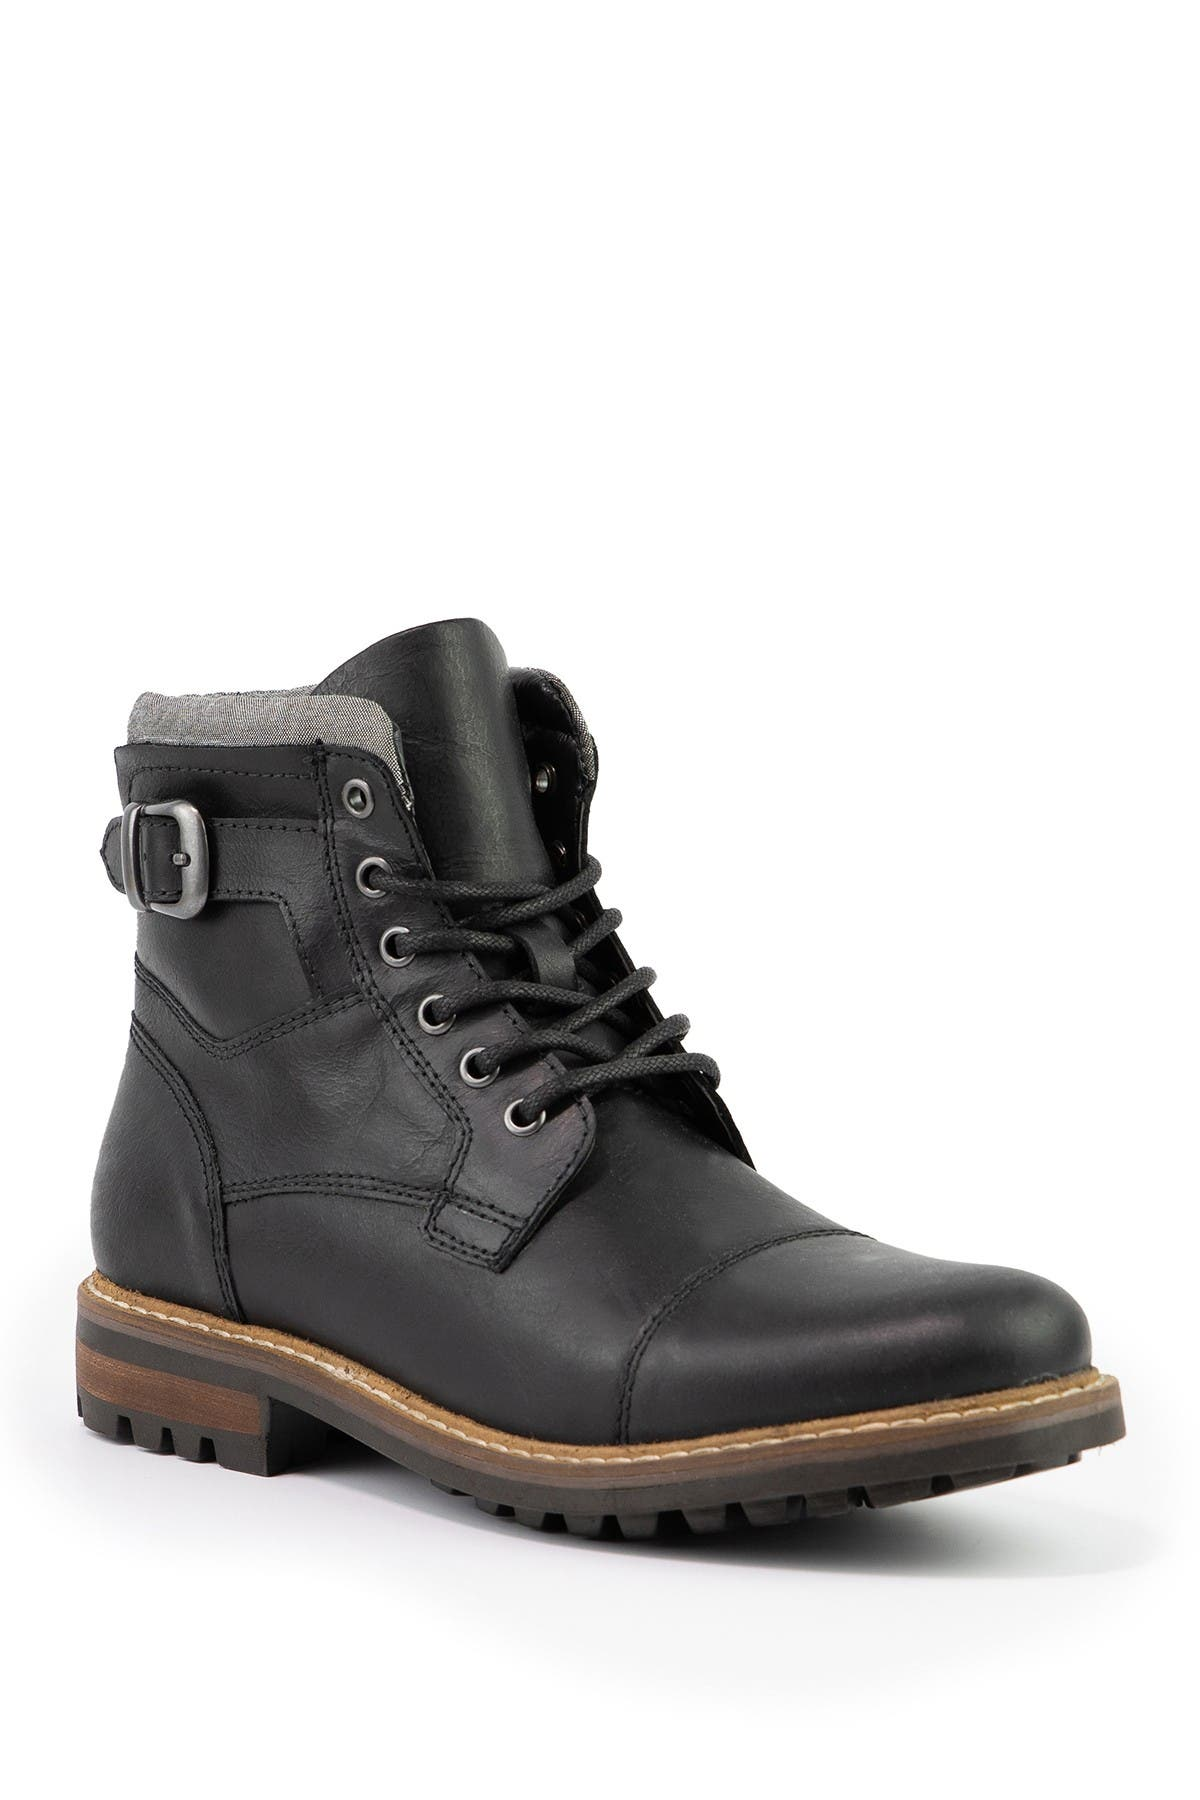 Image of Crevo Wickham Lace-Up Boot